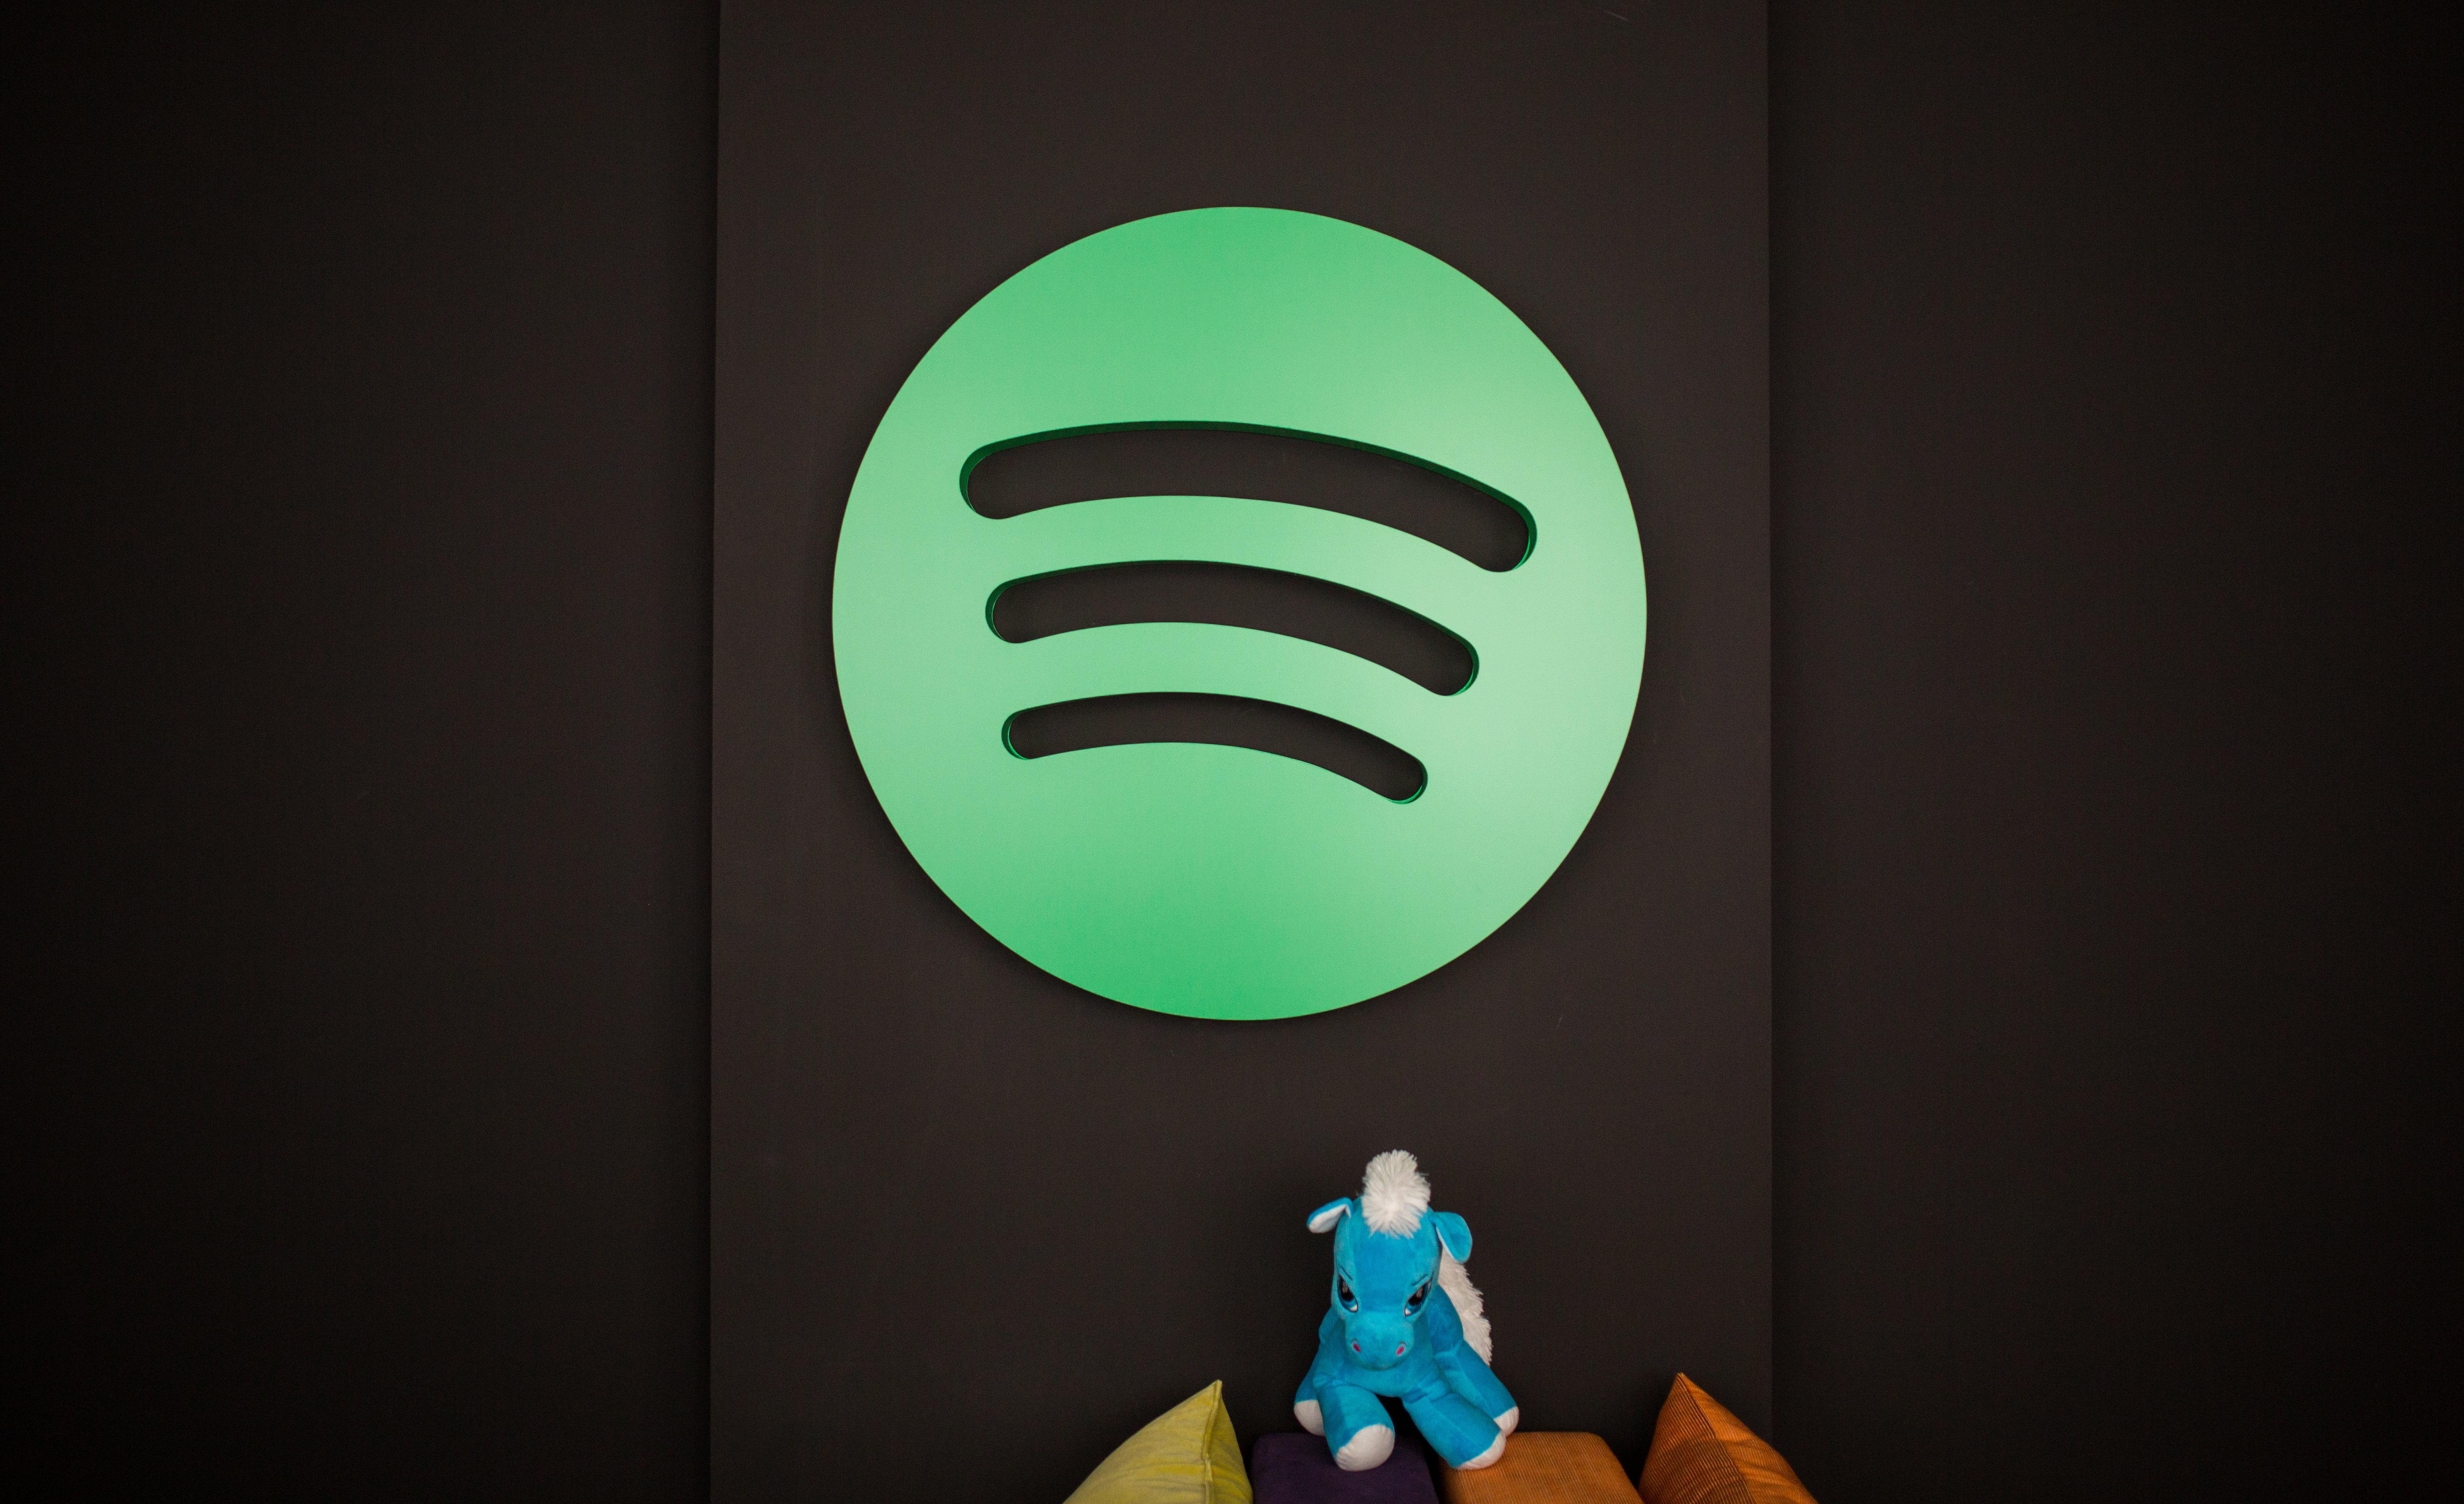 Neues Berliner Büro des Musikdienstes Spotify